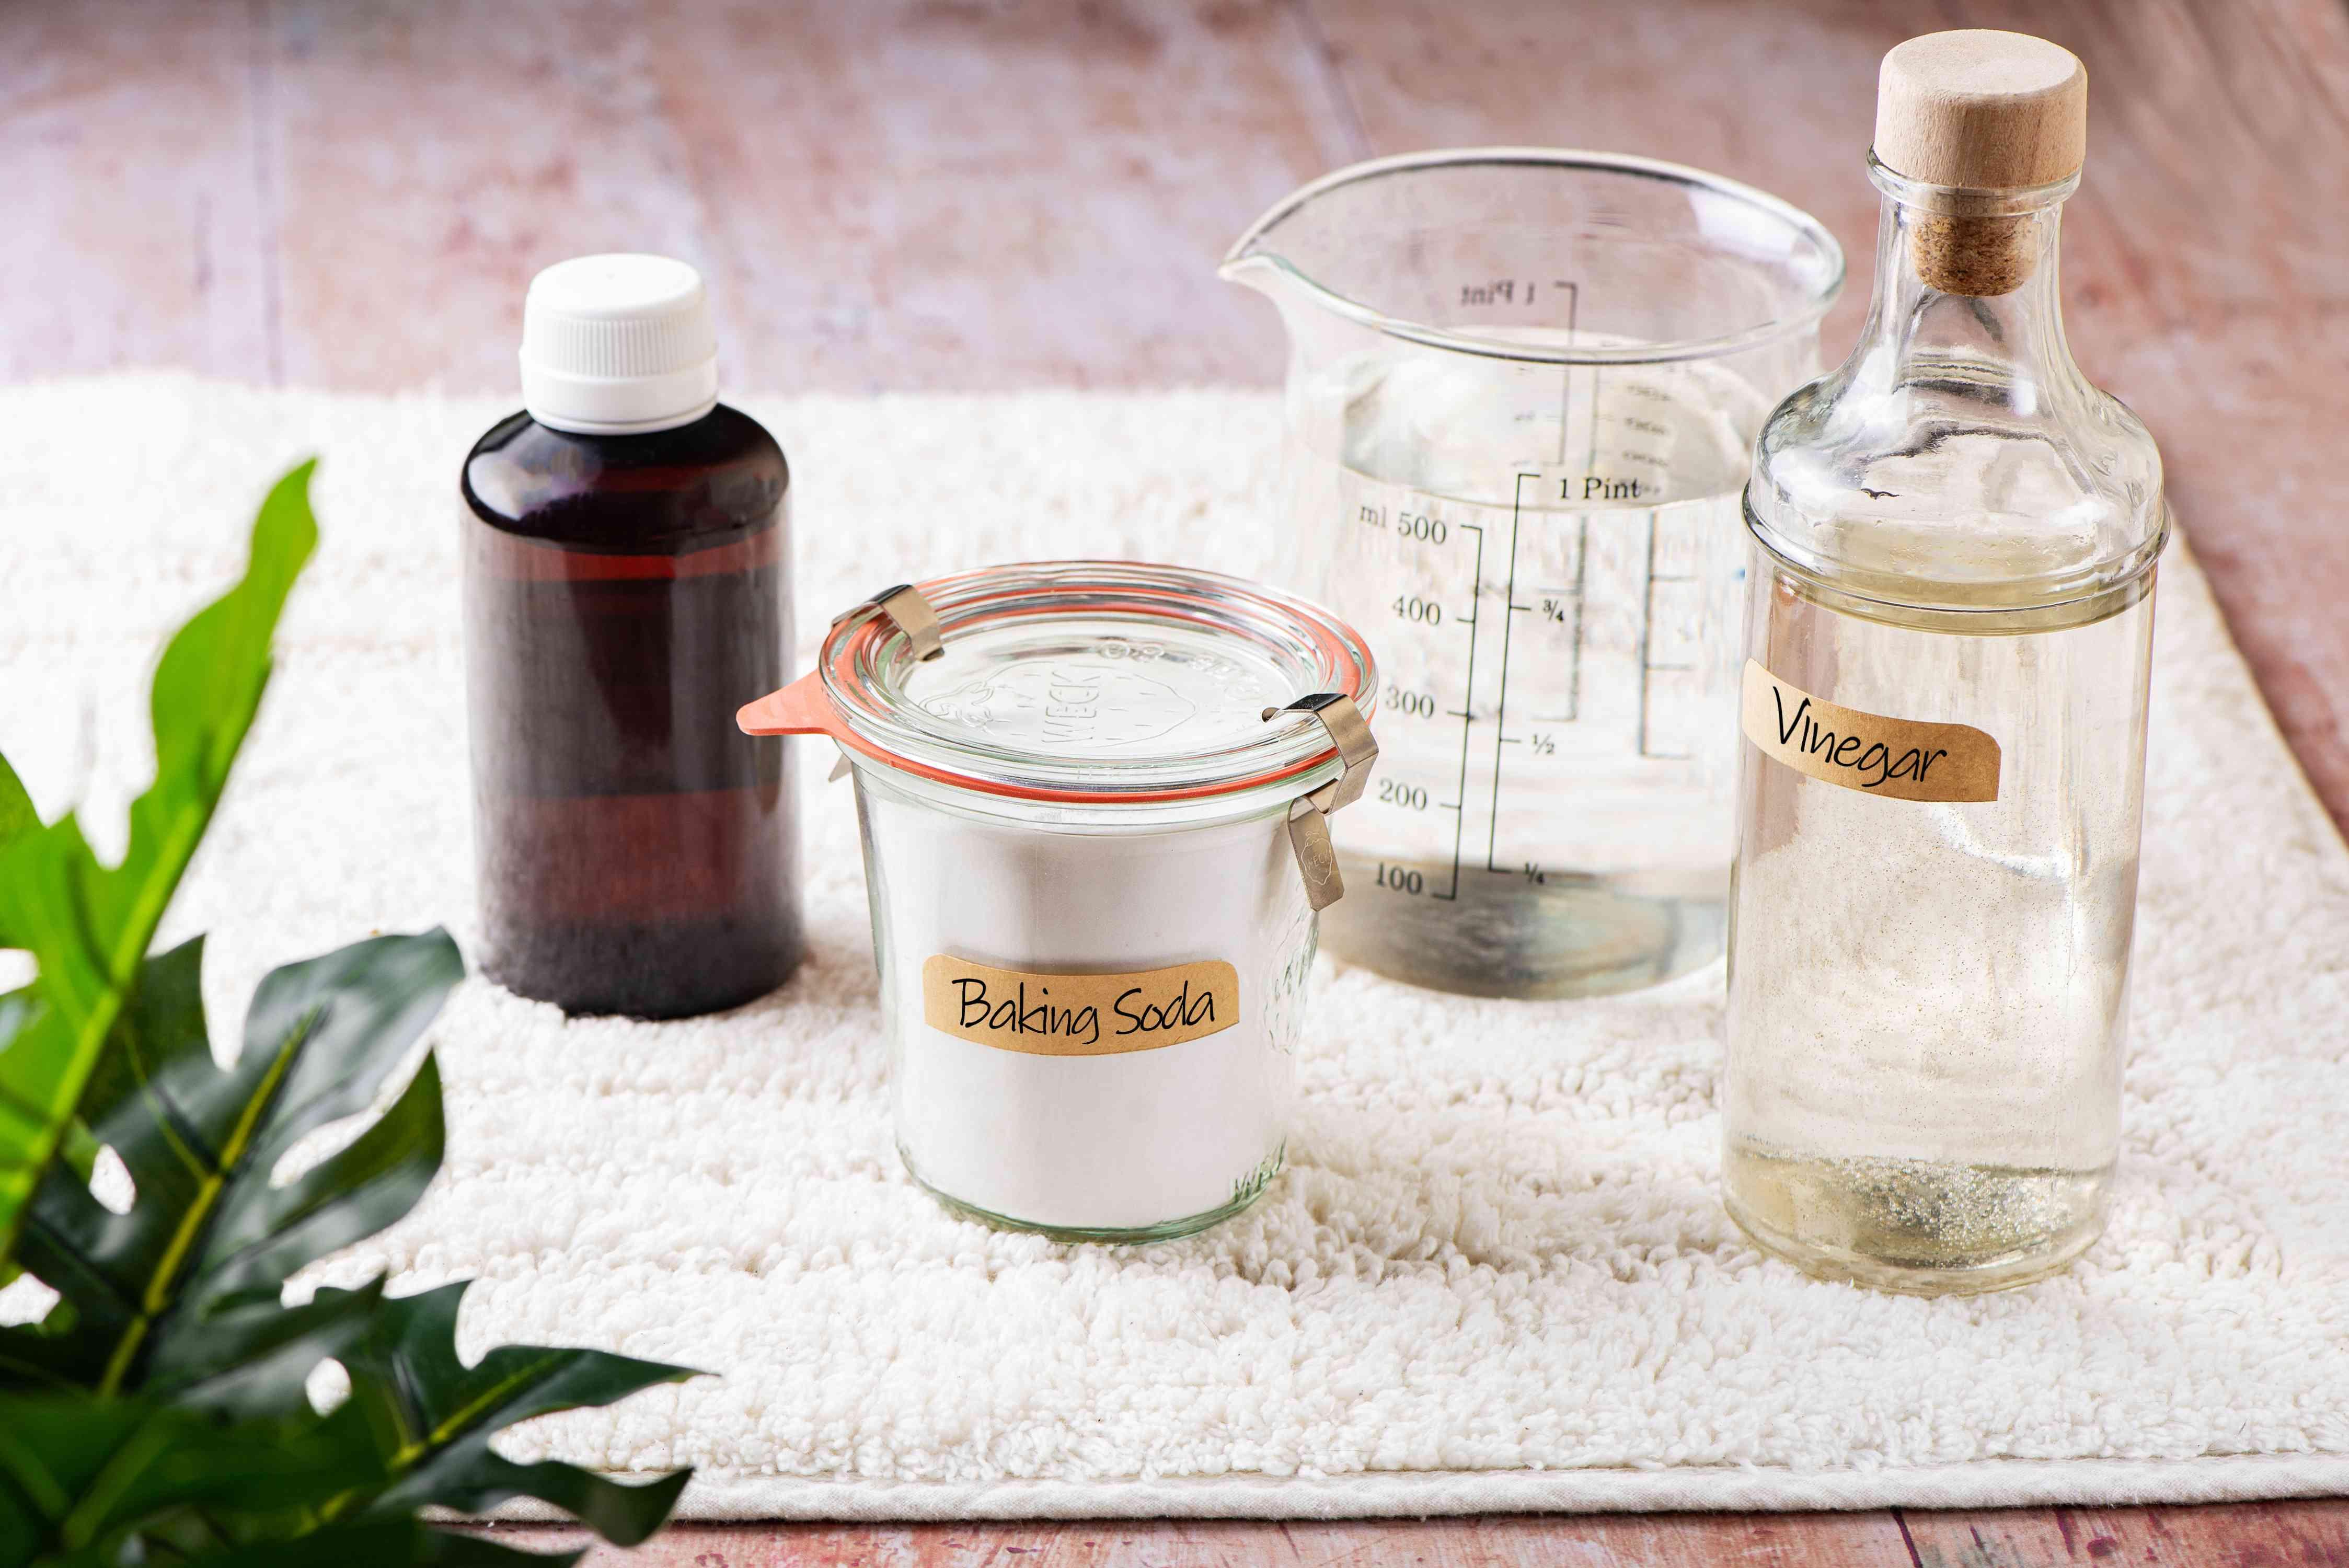 ingredients for carpet cleaner